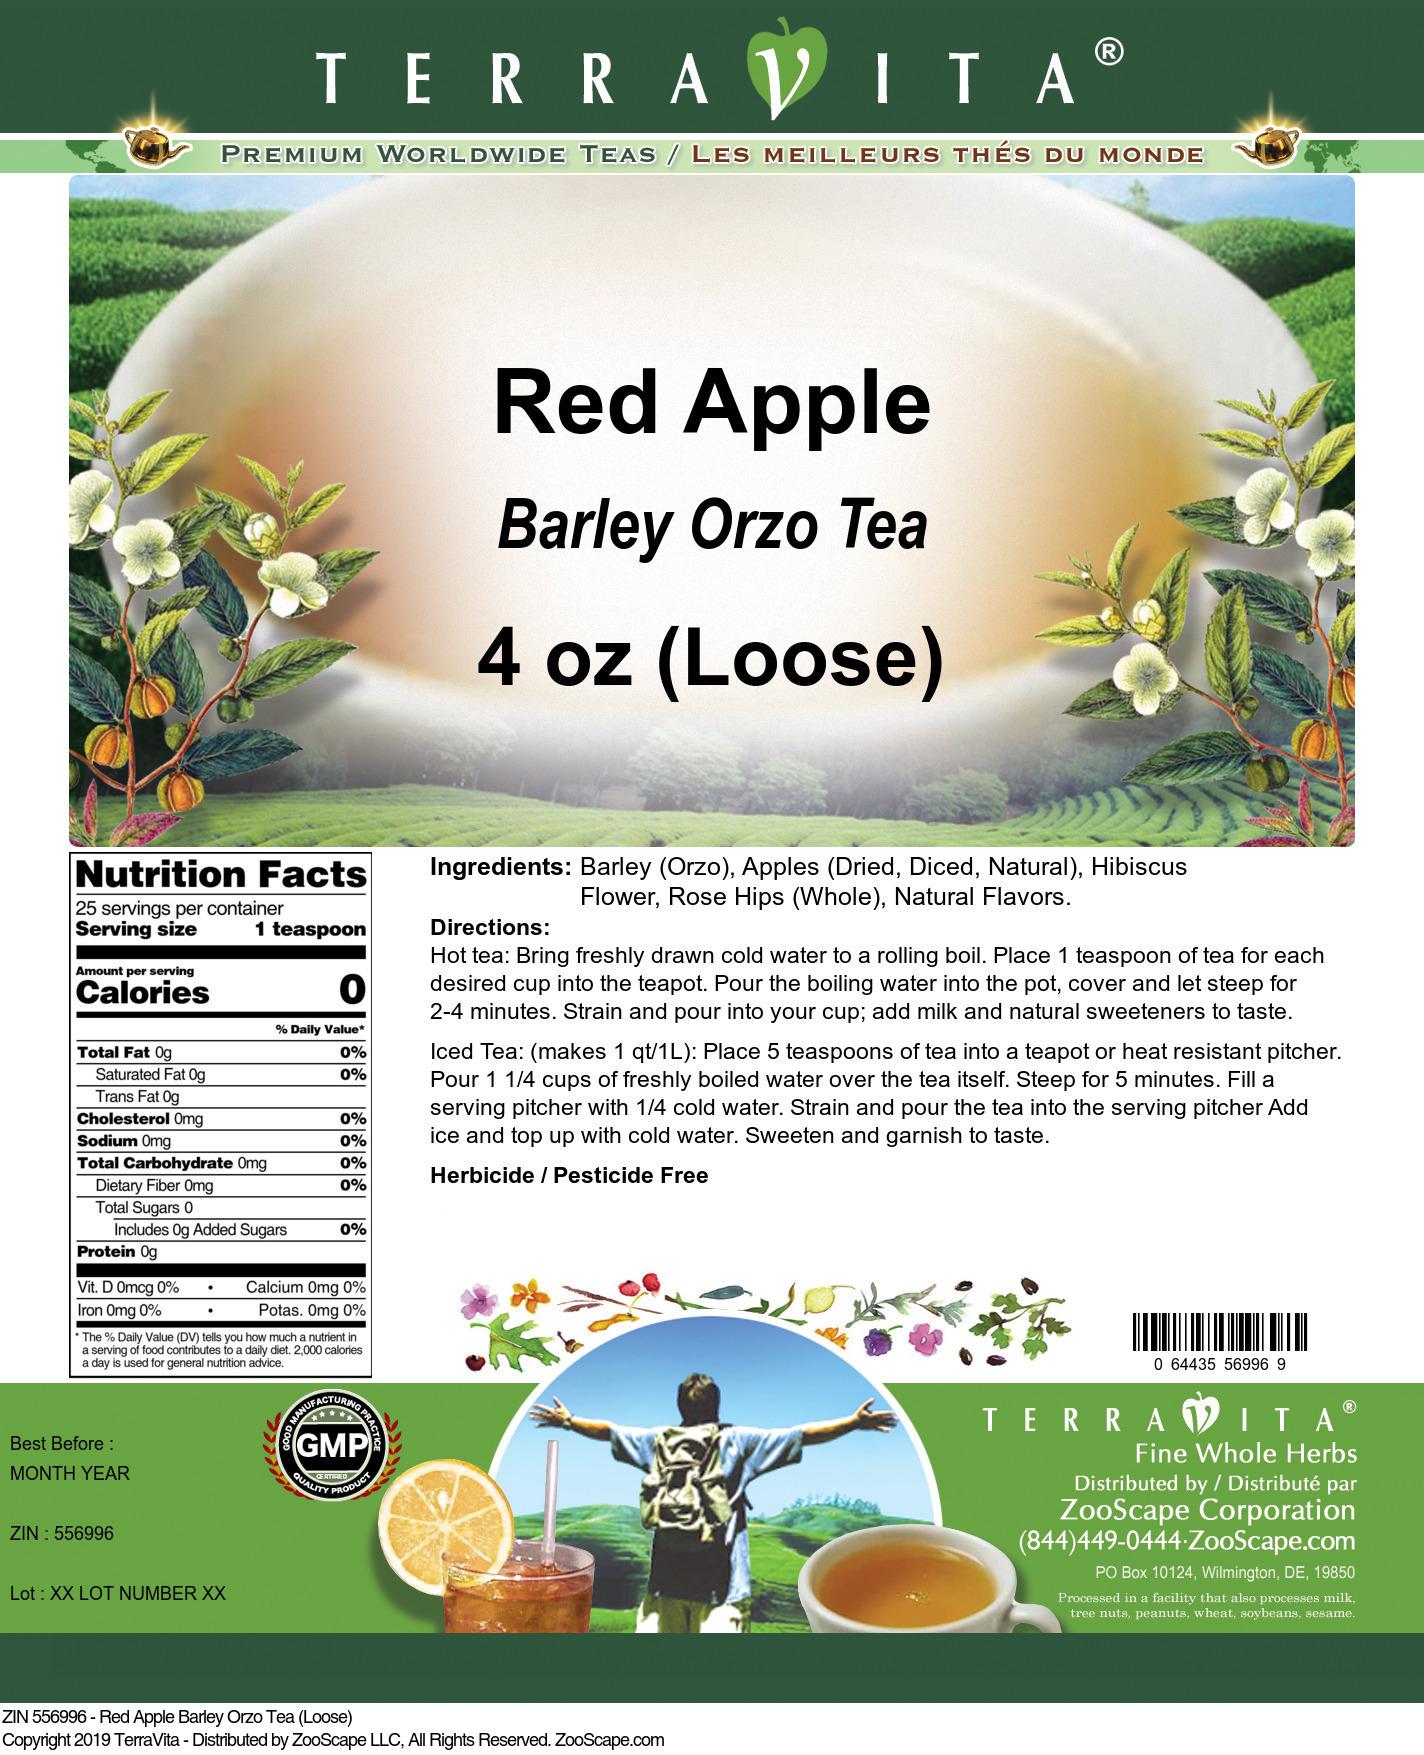 Red Apple Barley Orzo